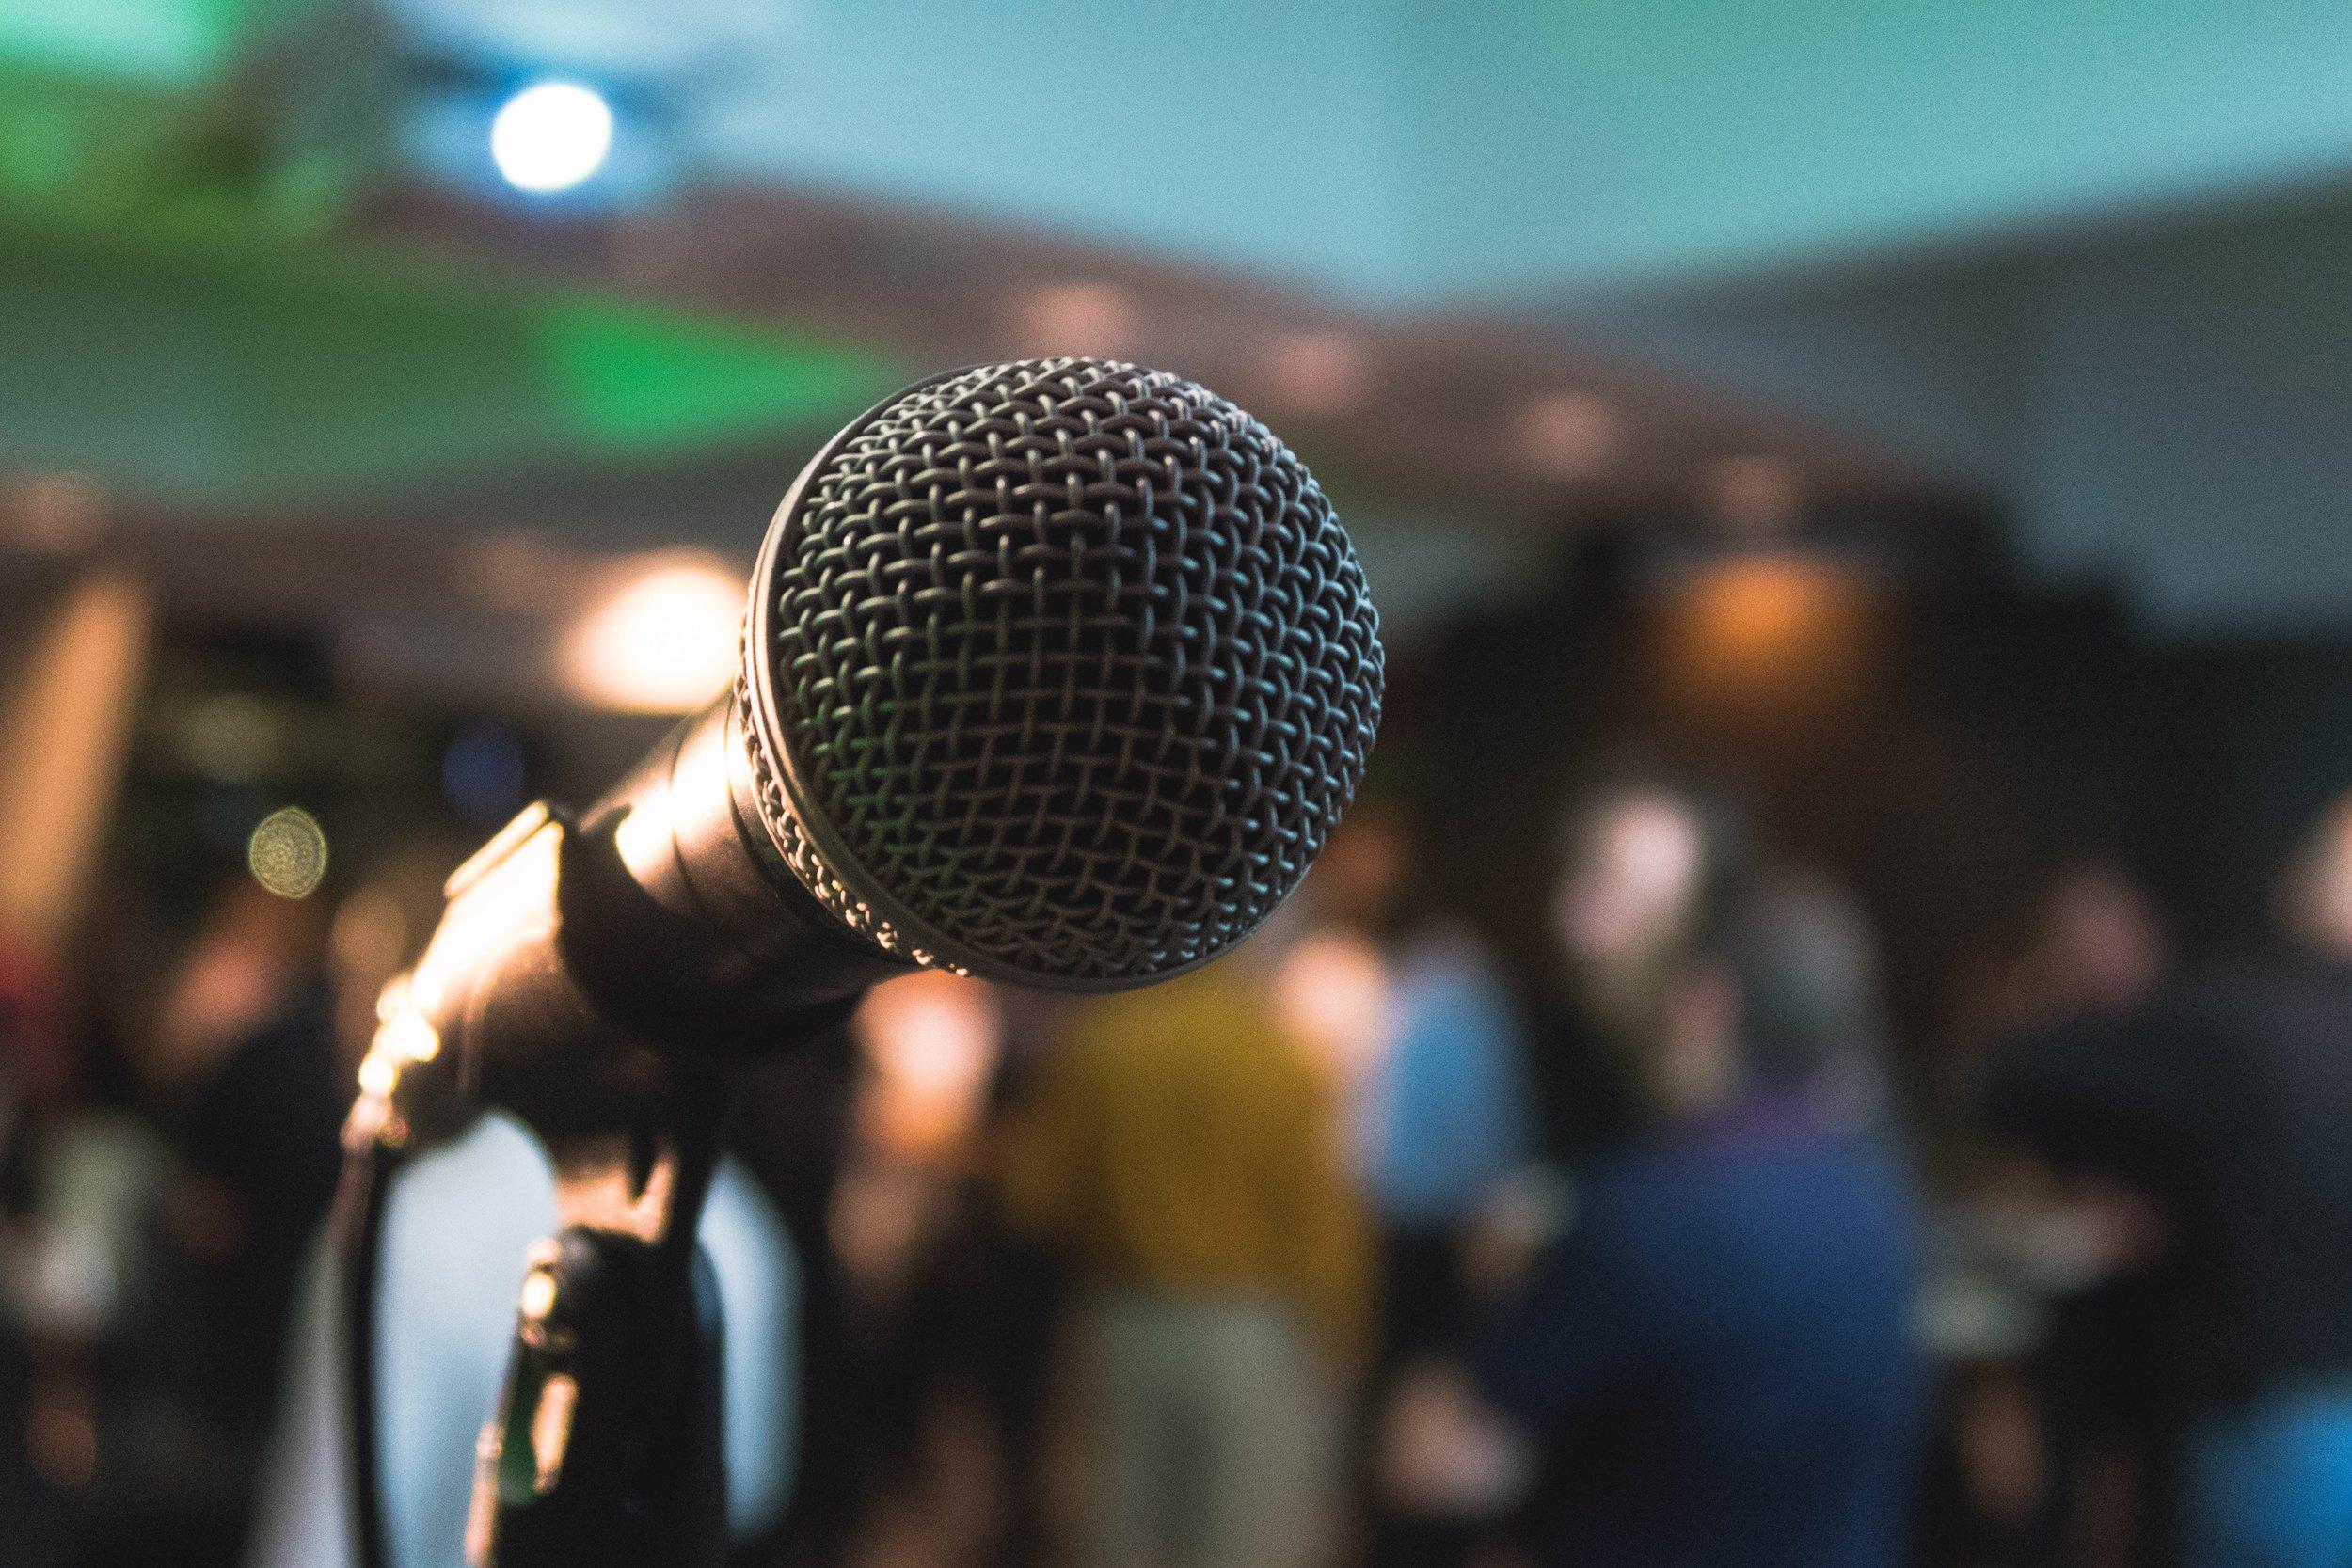 Choosing a brand voice